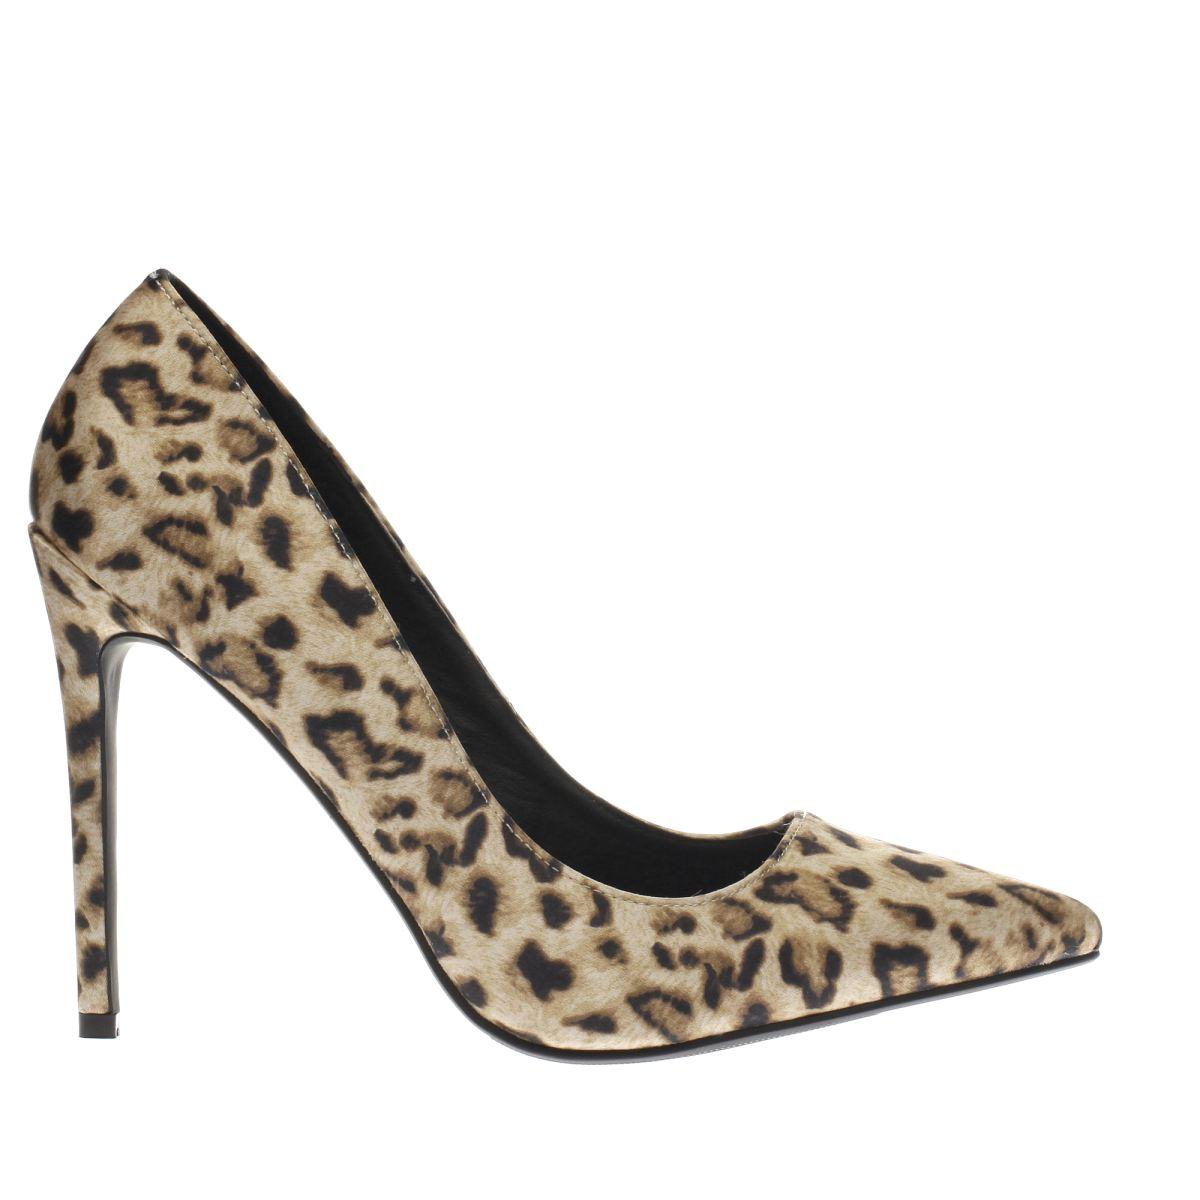 missguided beige & brown point toe high heels